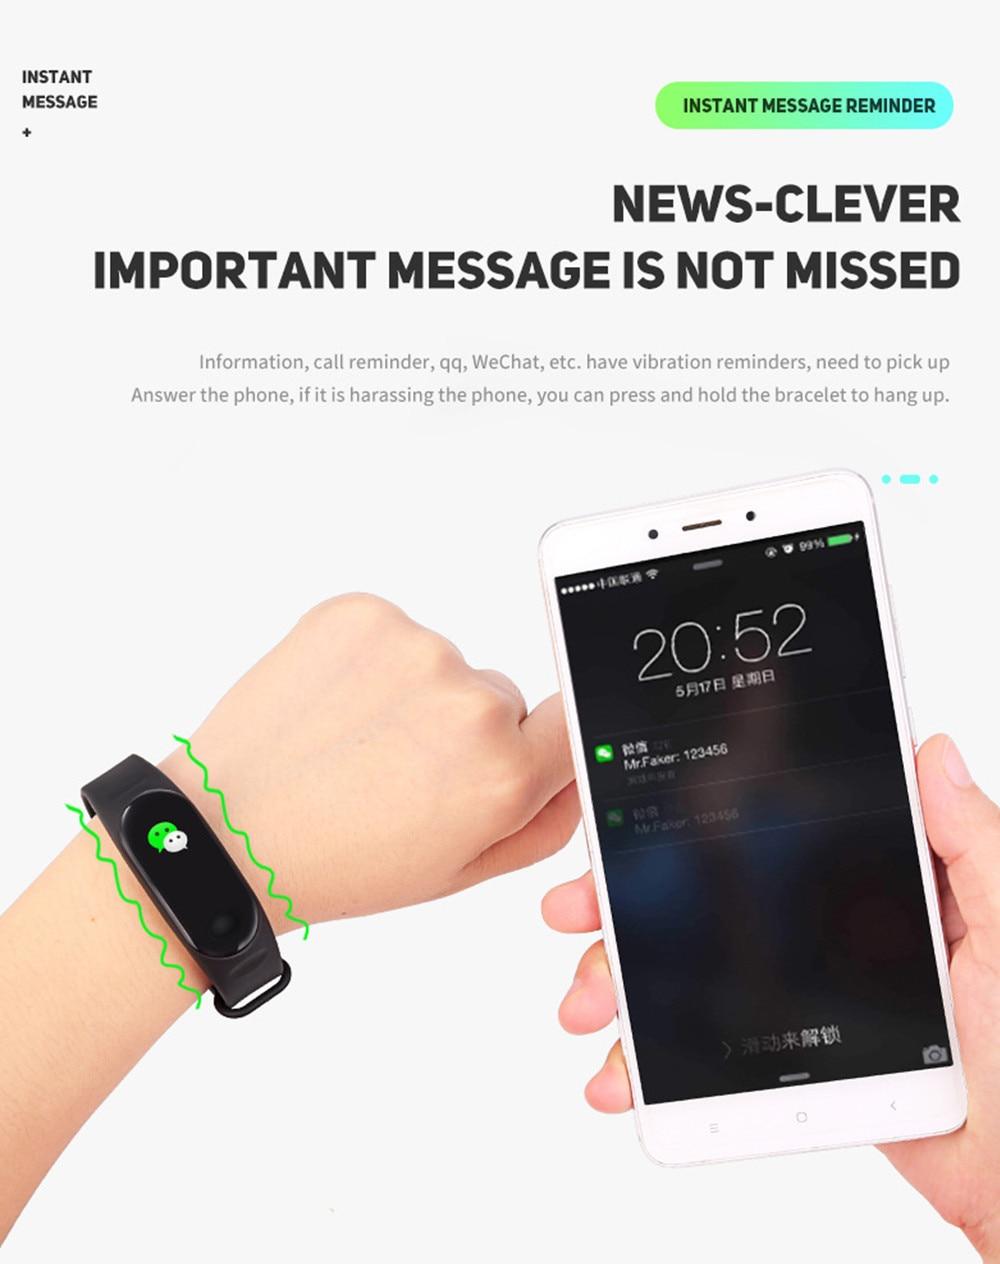 HTB1Msyra8Cw3KVjSZFuq6AAOpXa9 M3 Smart Watch Bracelet Band Fitness Tracker Messages Reminder Color Screen Waterproof Sport Wristband For men women